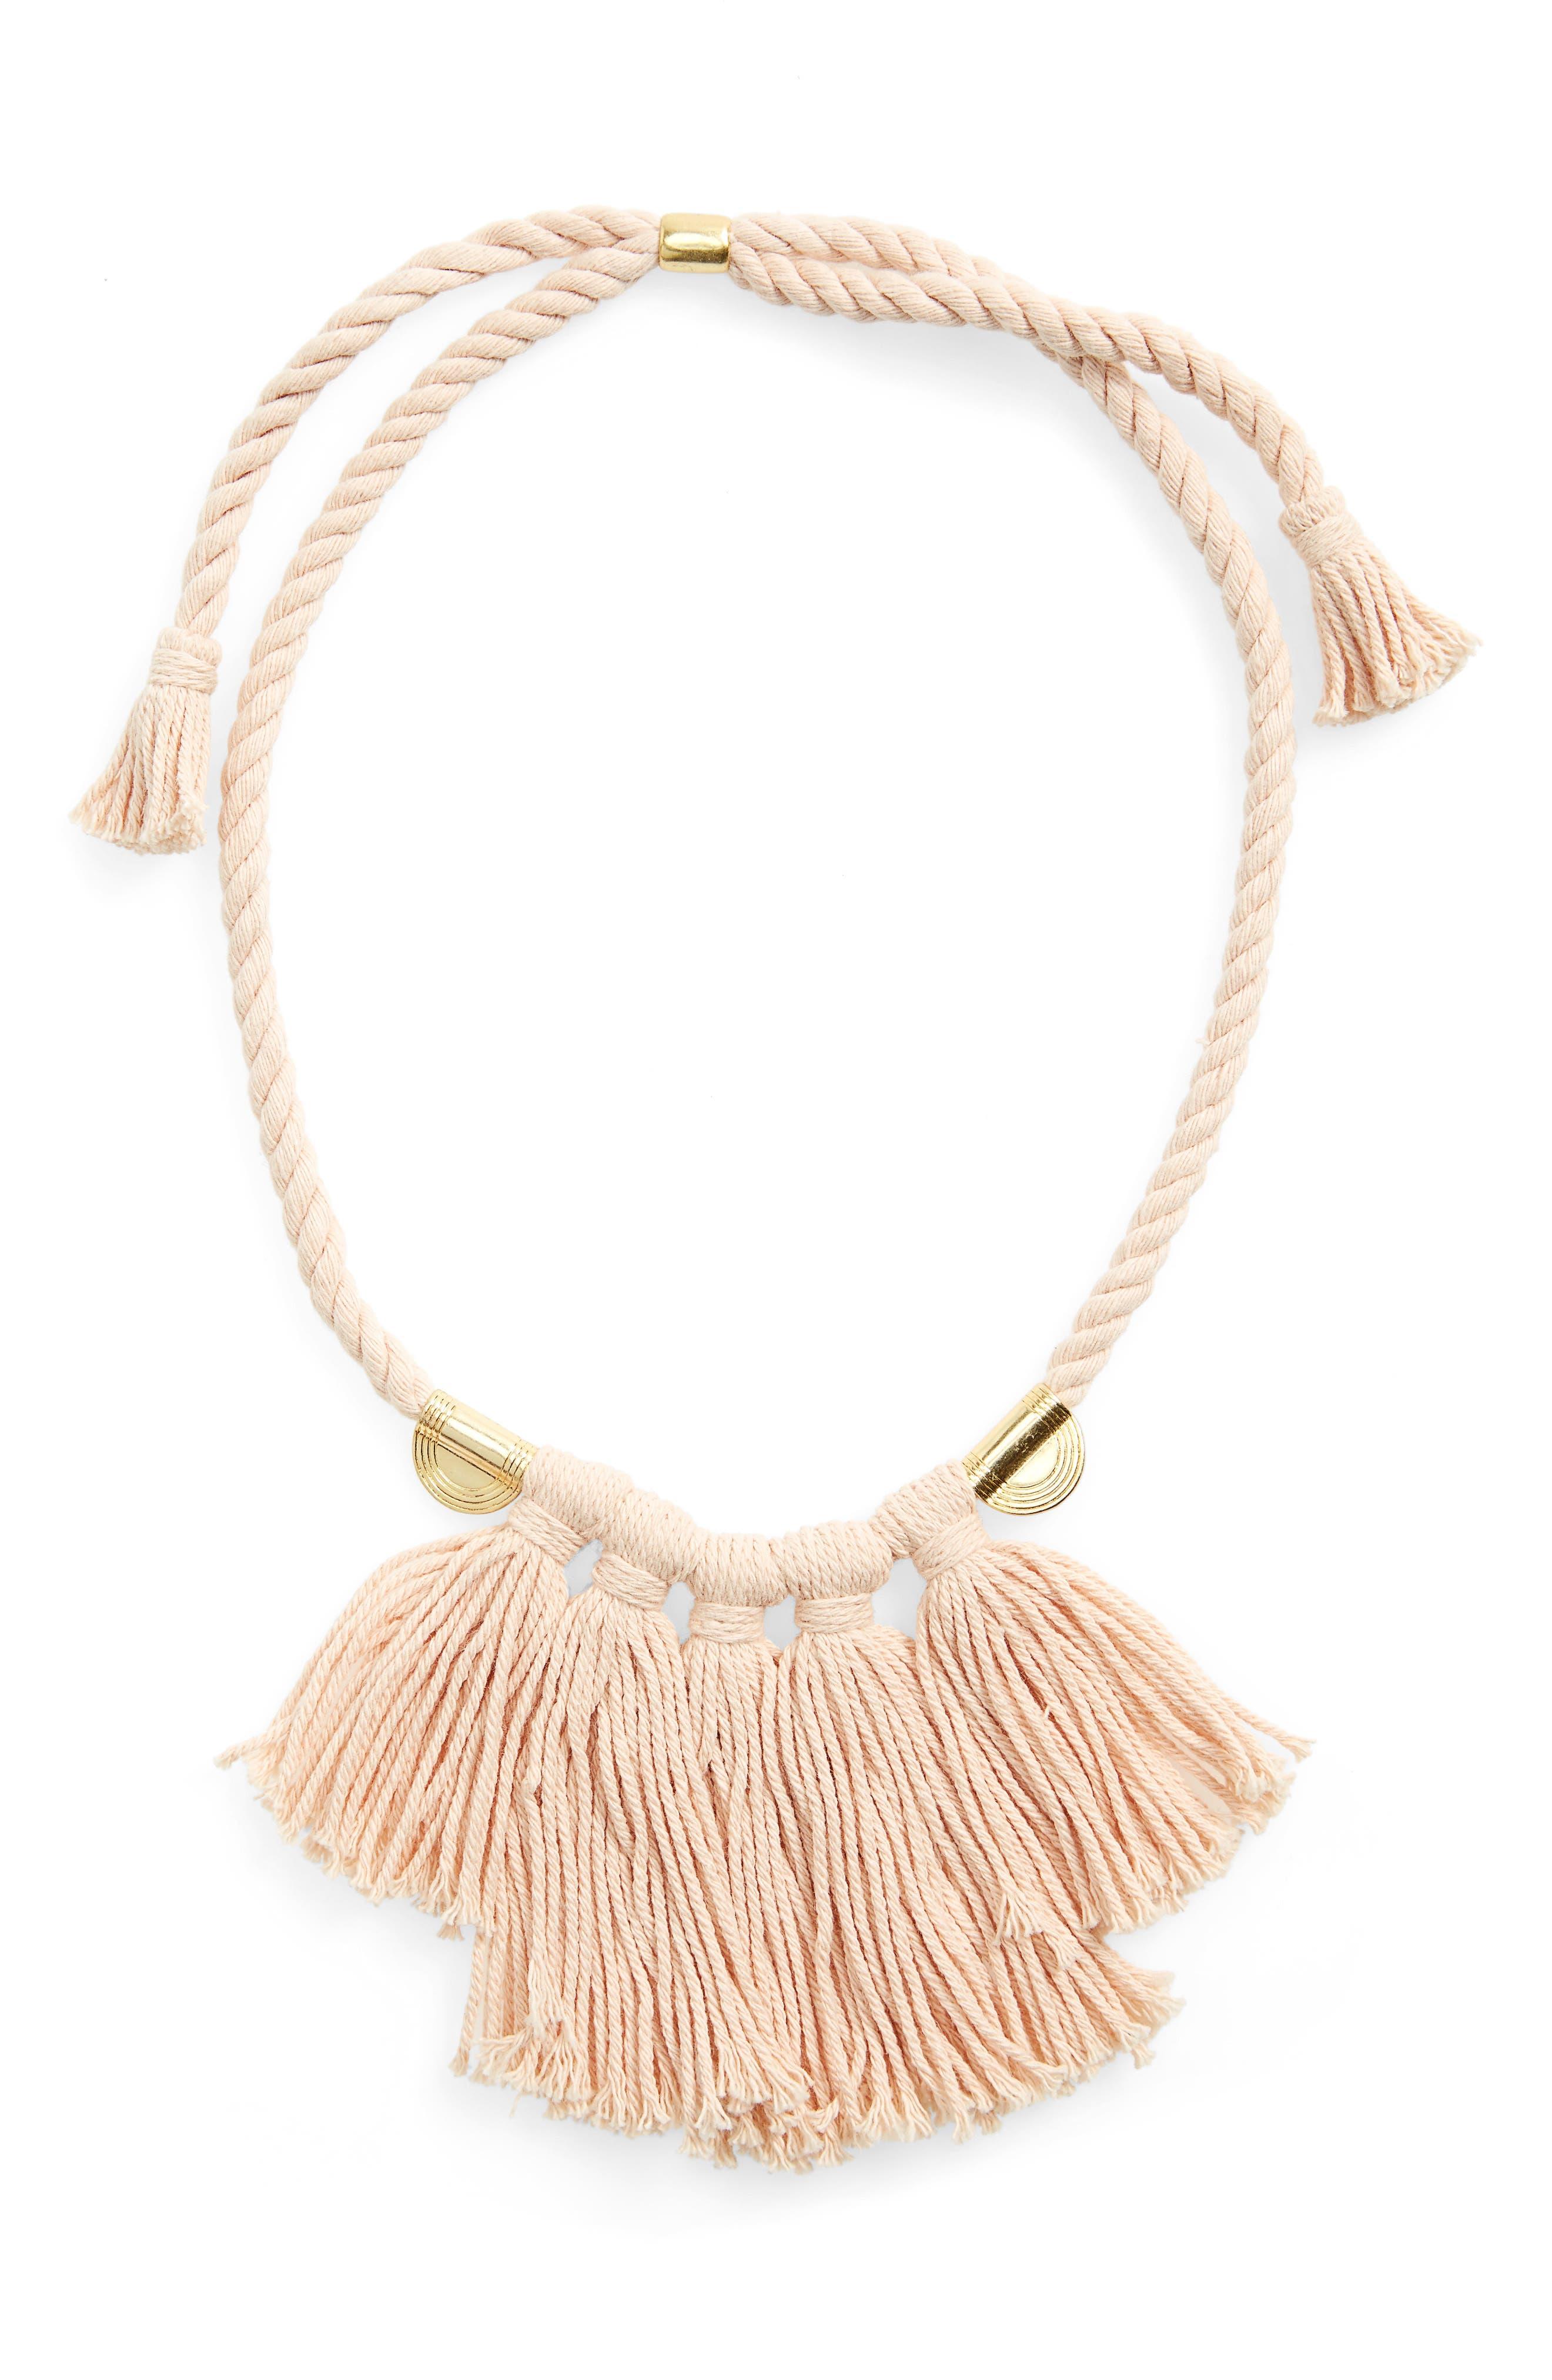 Main Image - Madewell Tassel Statement Necklace